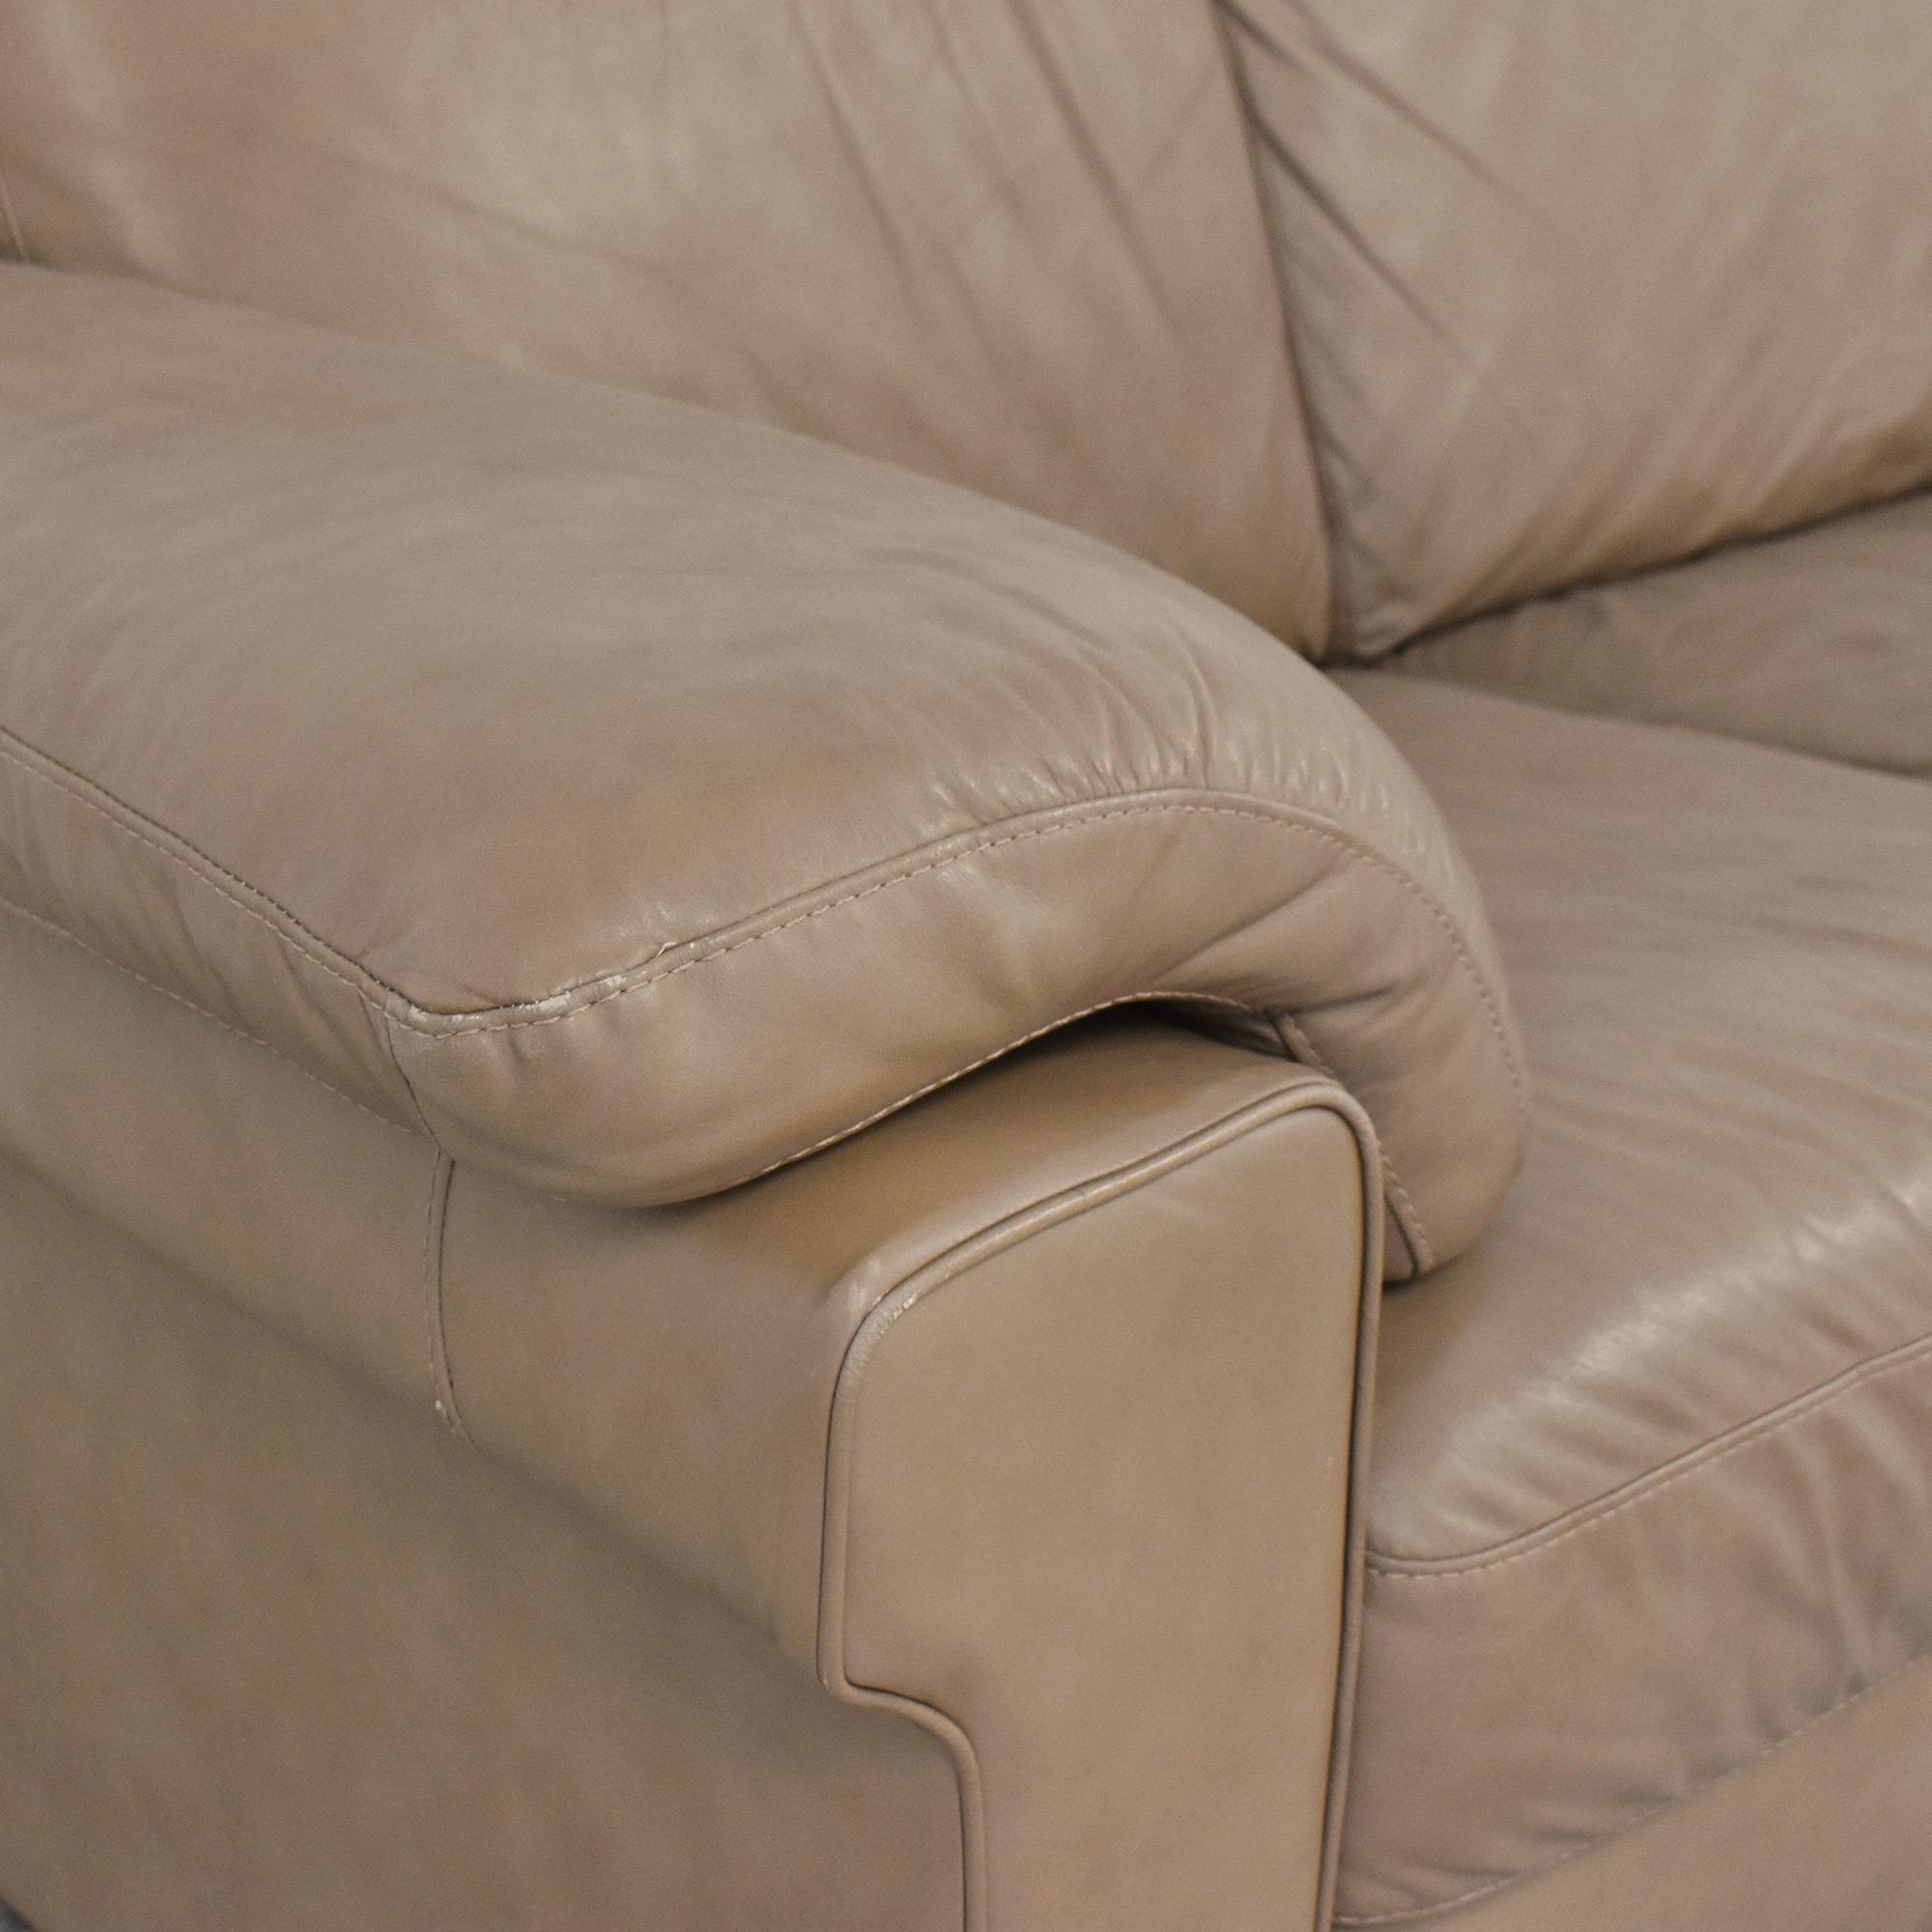 Natuzzi Natuzzi Three Seat Sofa price